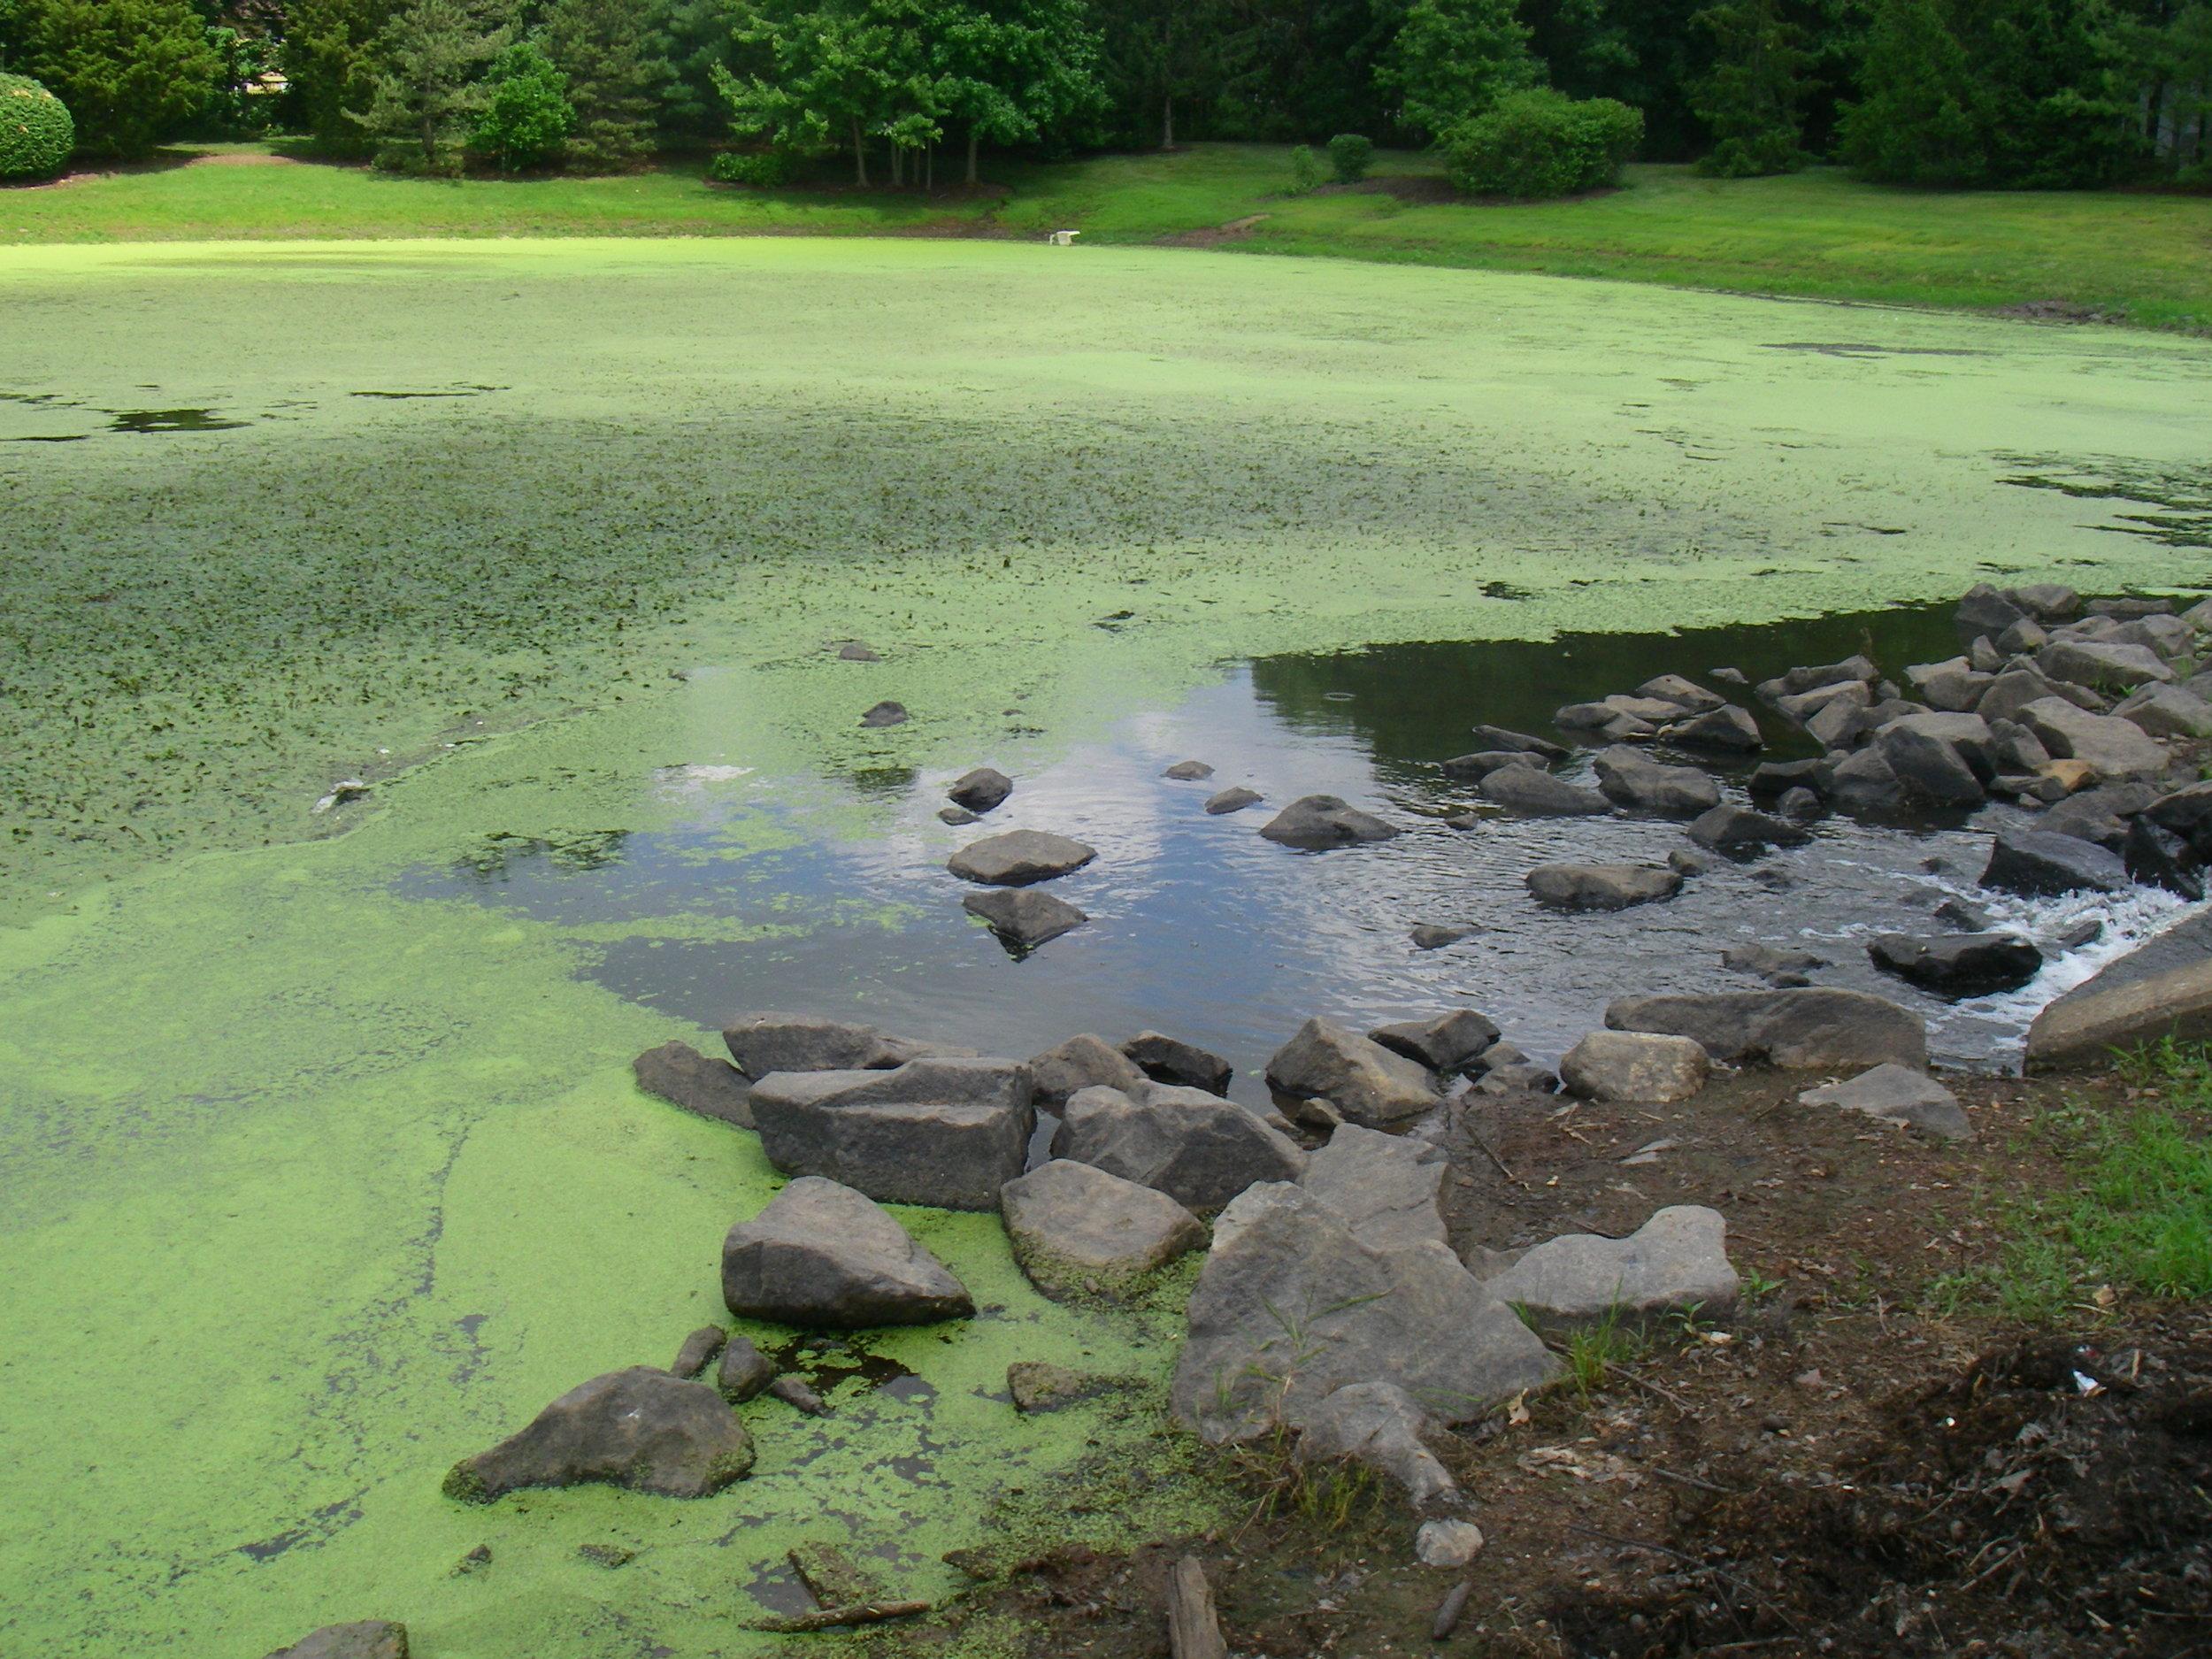 excessive algae growth in pond